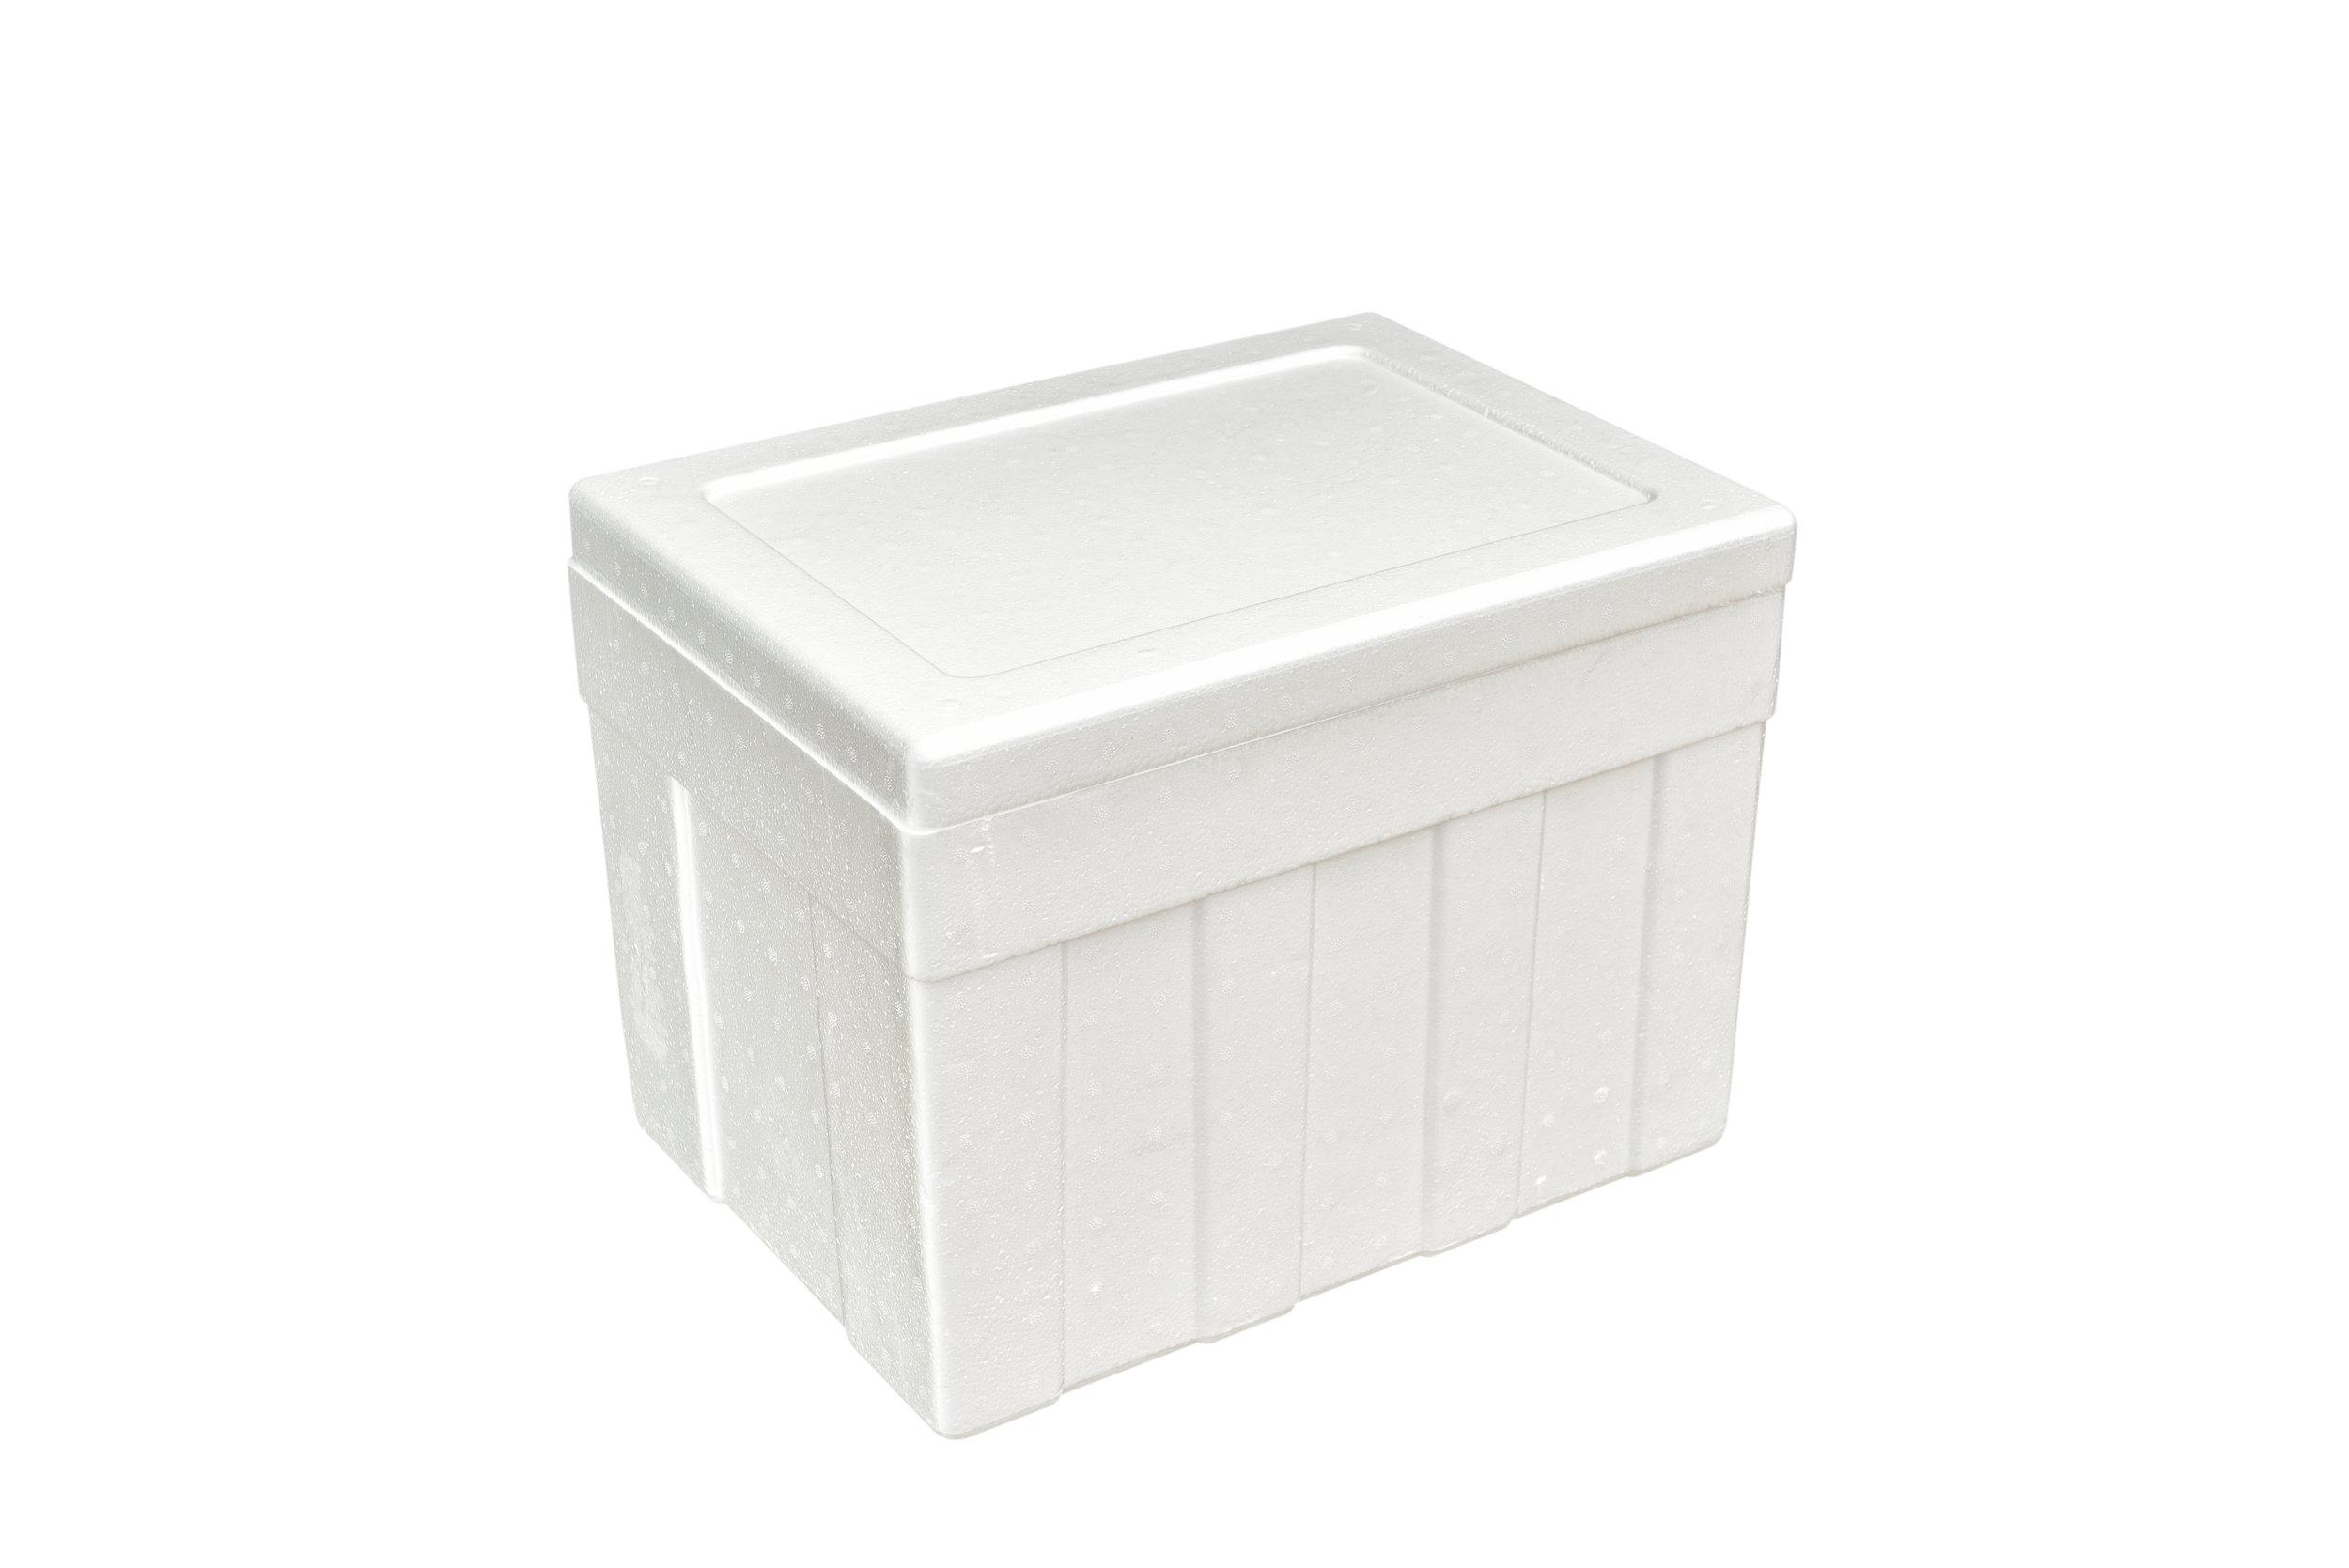 styrofoam box.jpg